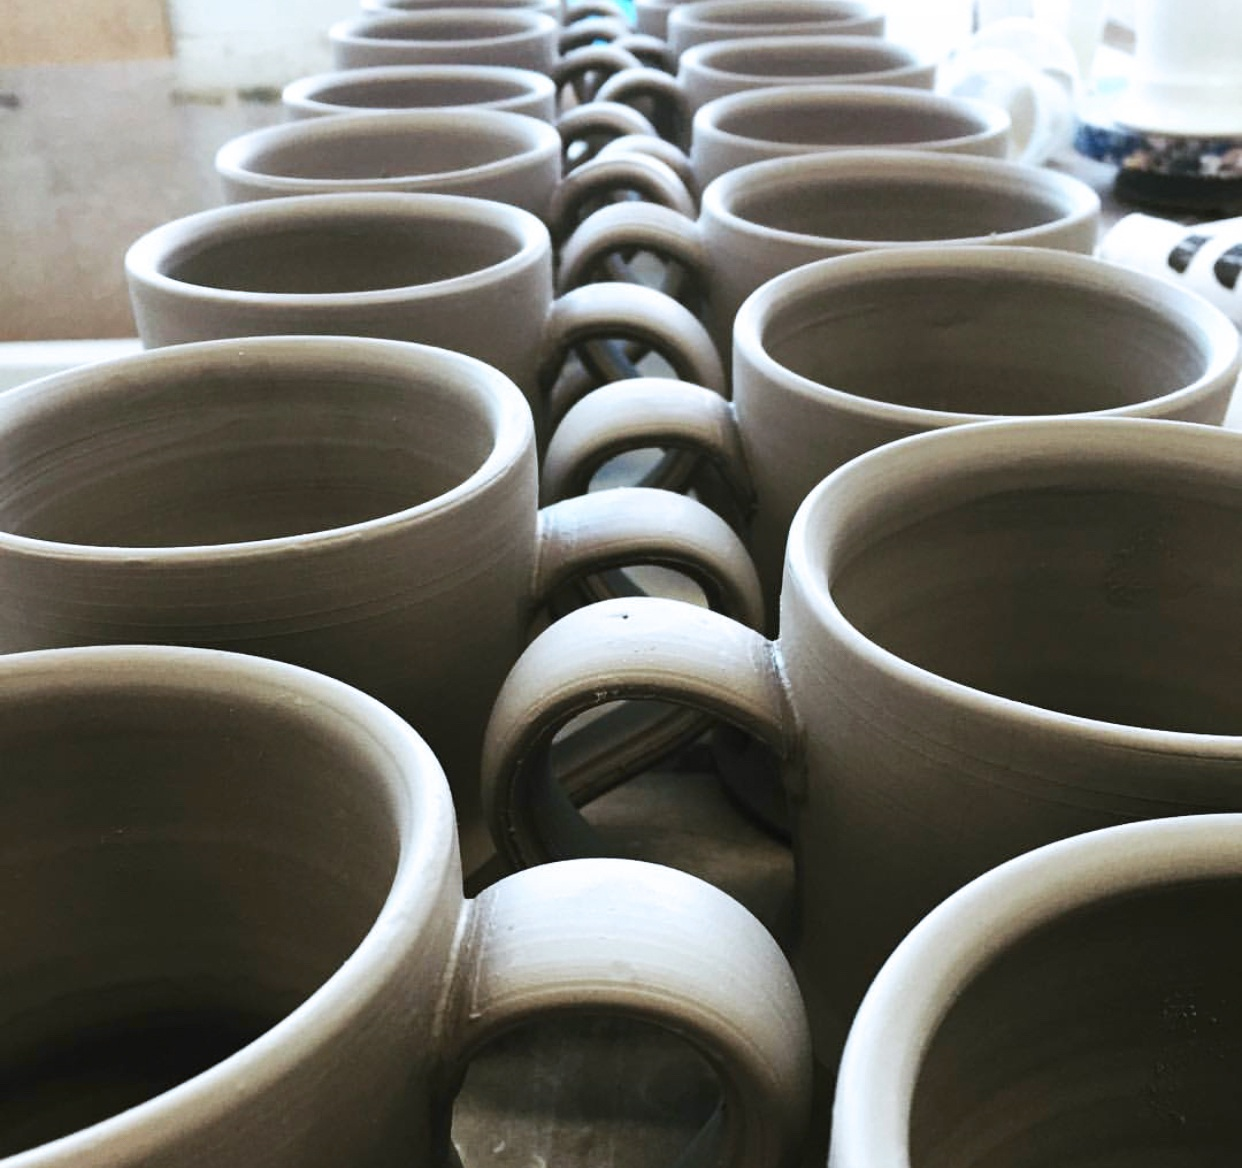 greenware+mugs.jpg